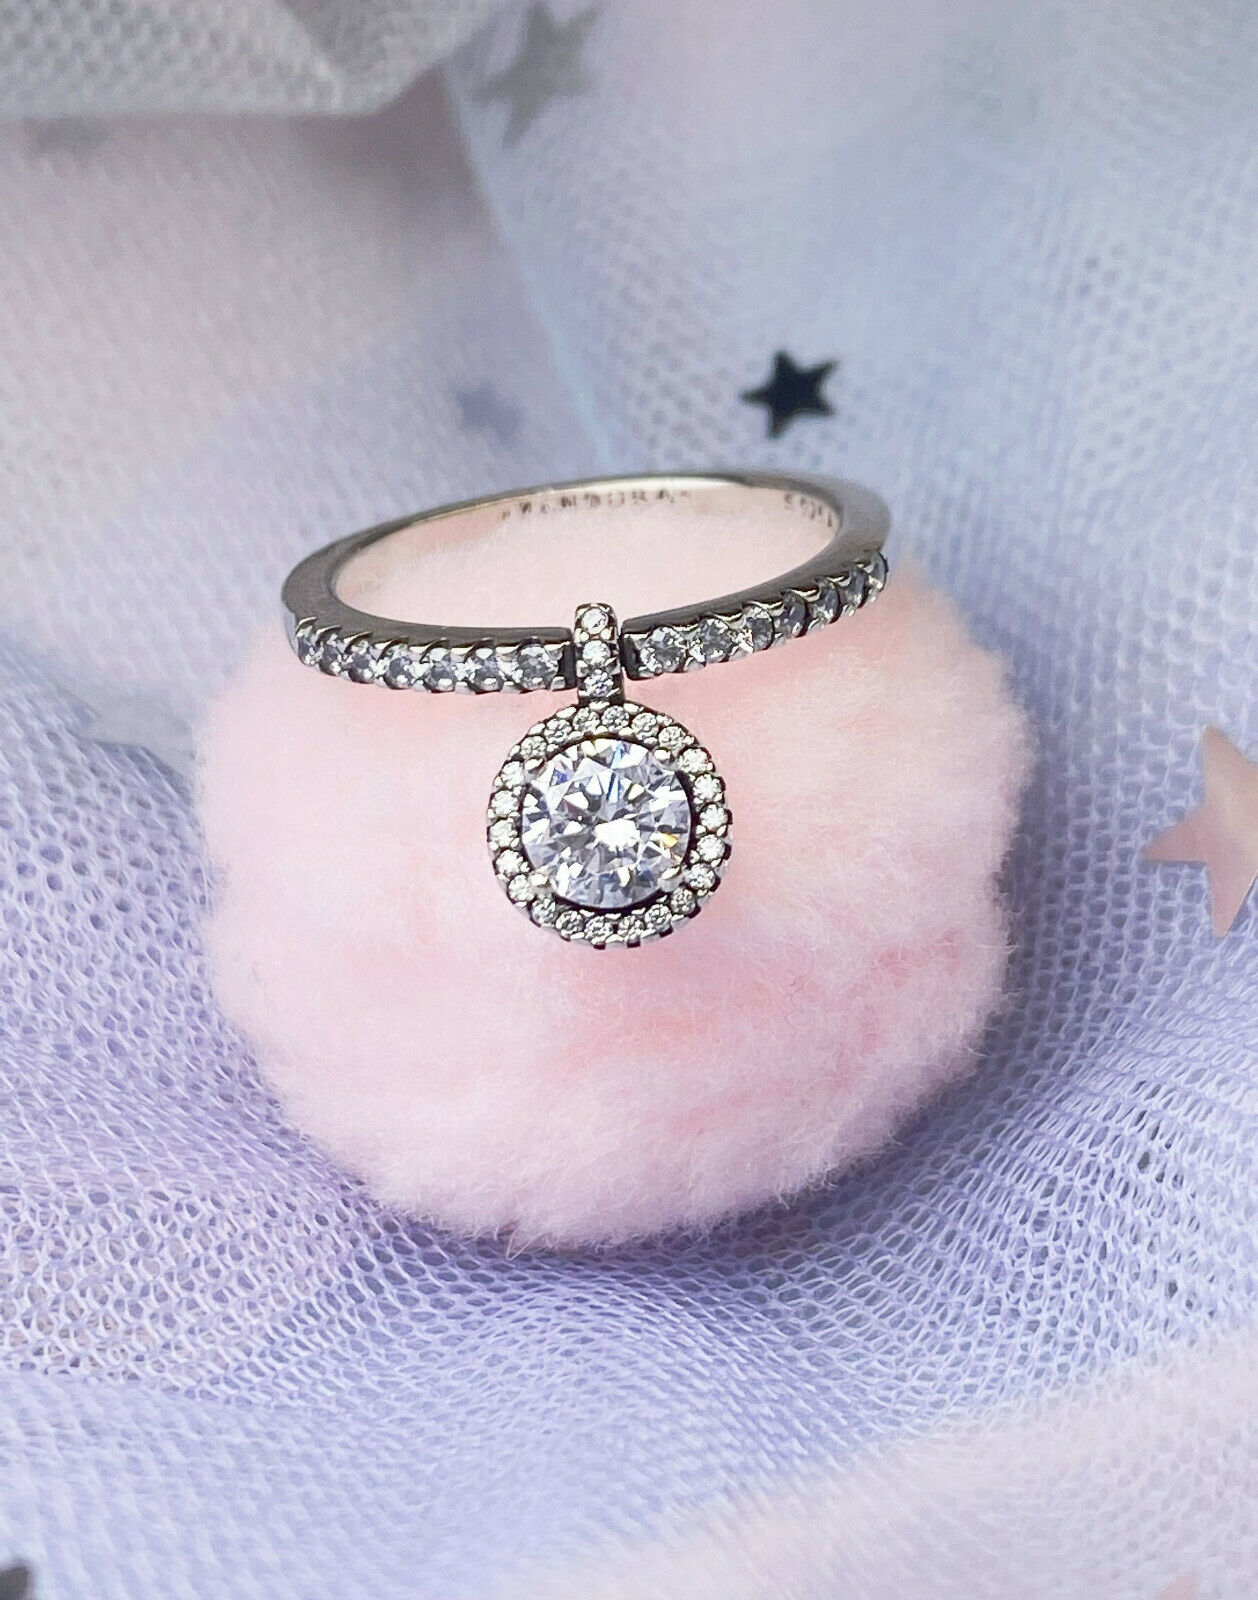 Authentic Silver 925 ALE Pandora Dangling Round Sparkle Ring 198491C02 Size 6 - $11.11